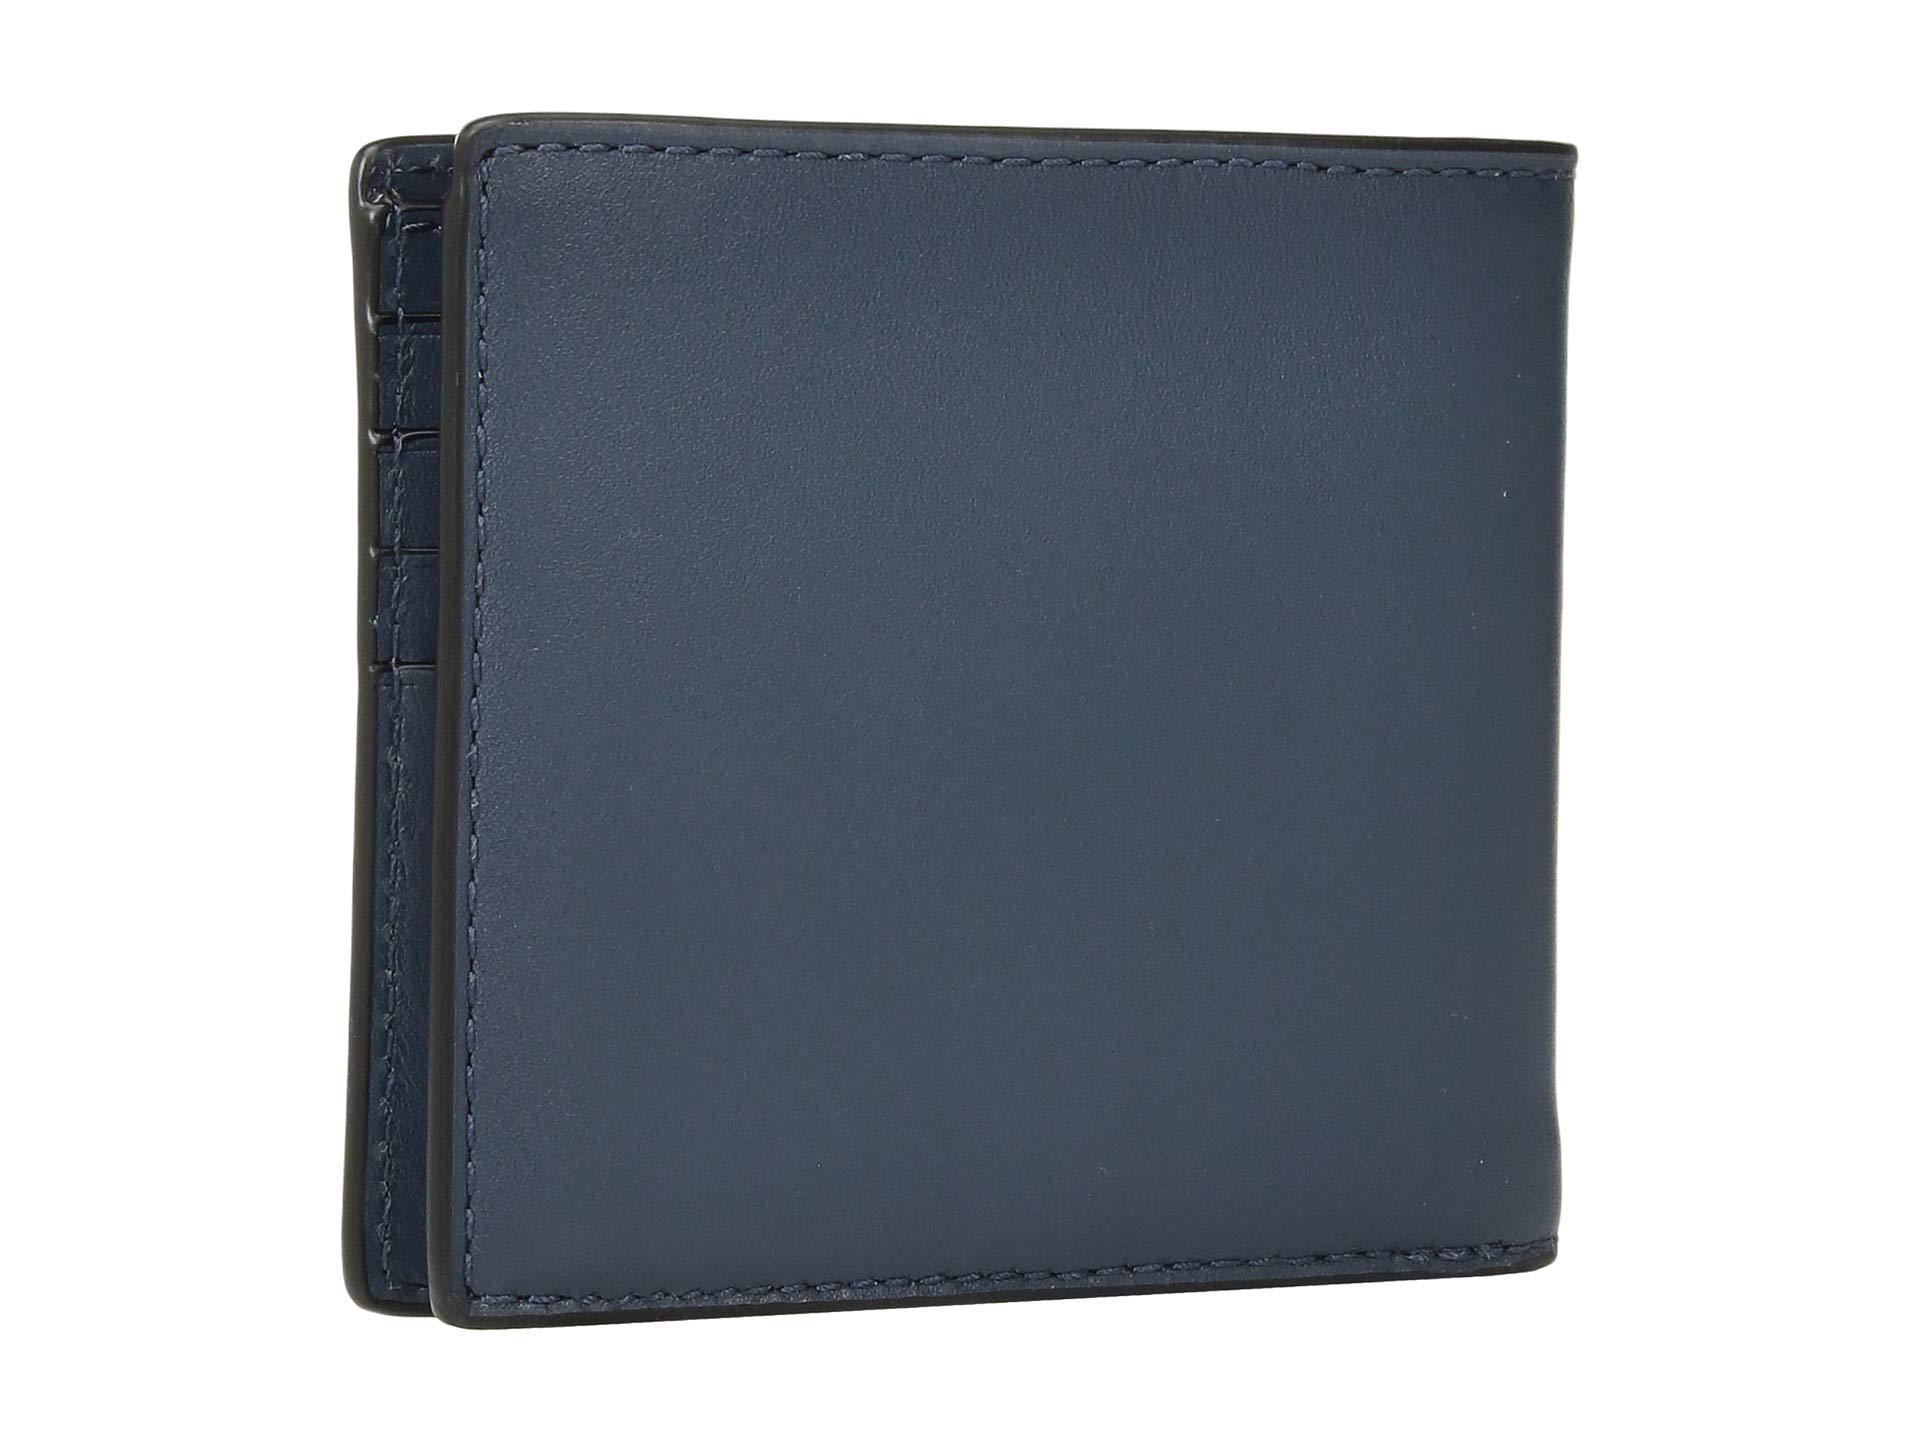 19166058729e COACH - Double Billfold In Signature Hardware (blue) Bill-fold Wallet for  Men. View fullscreen